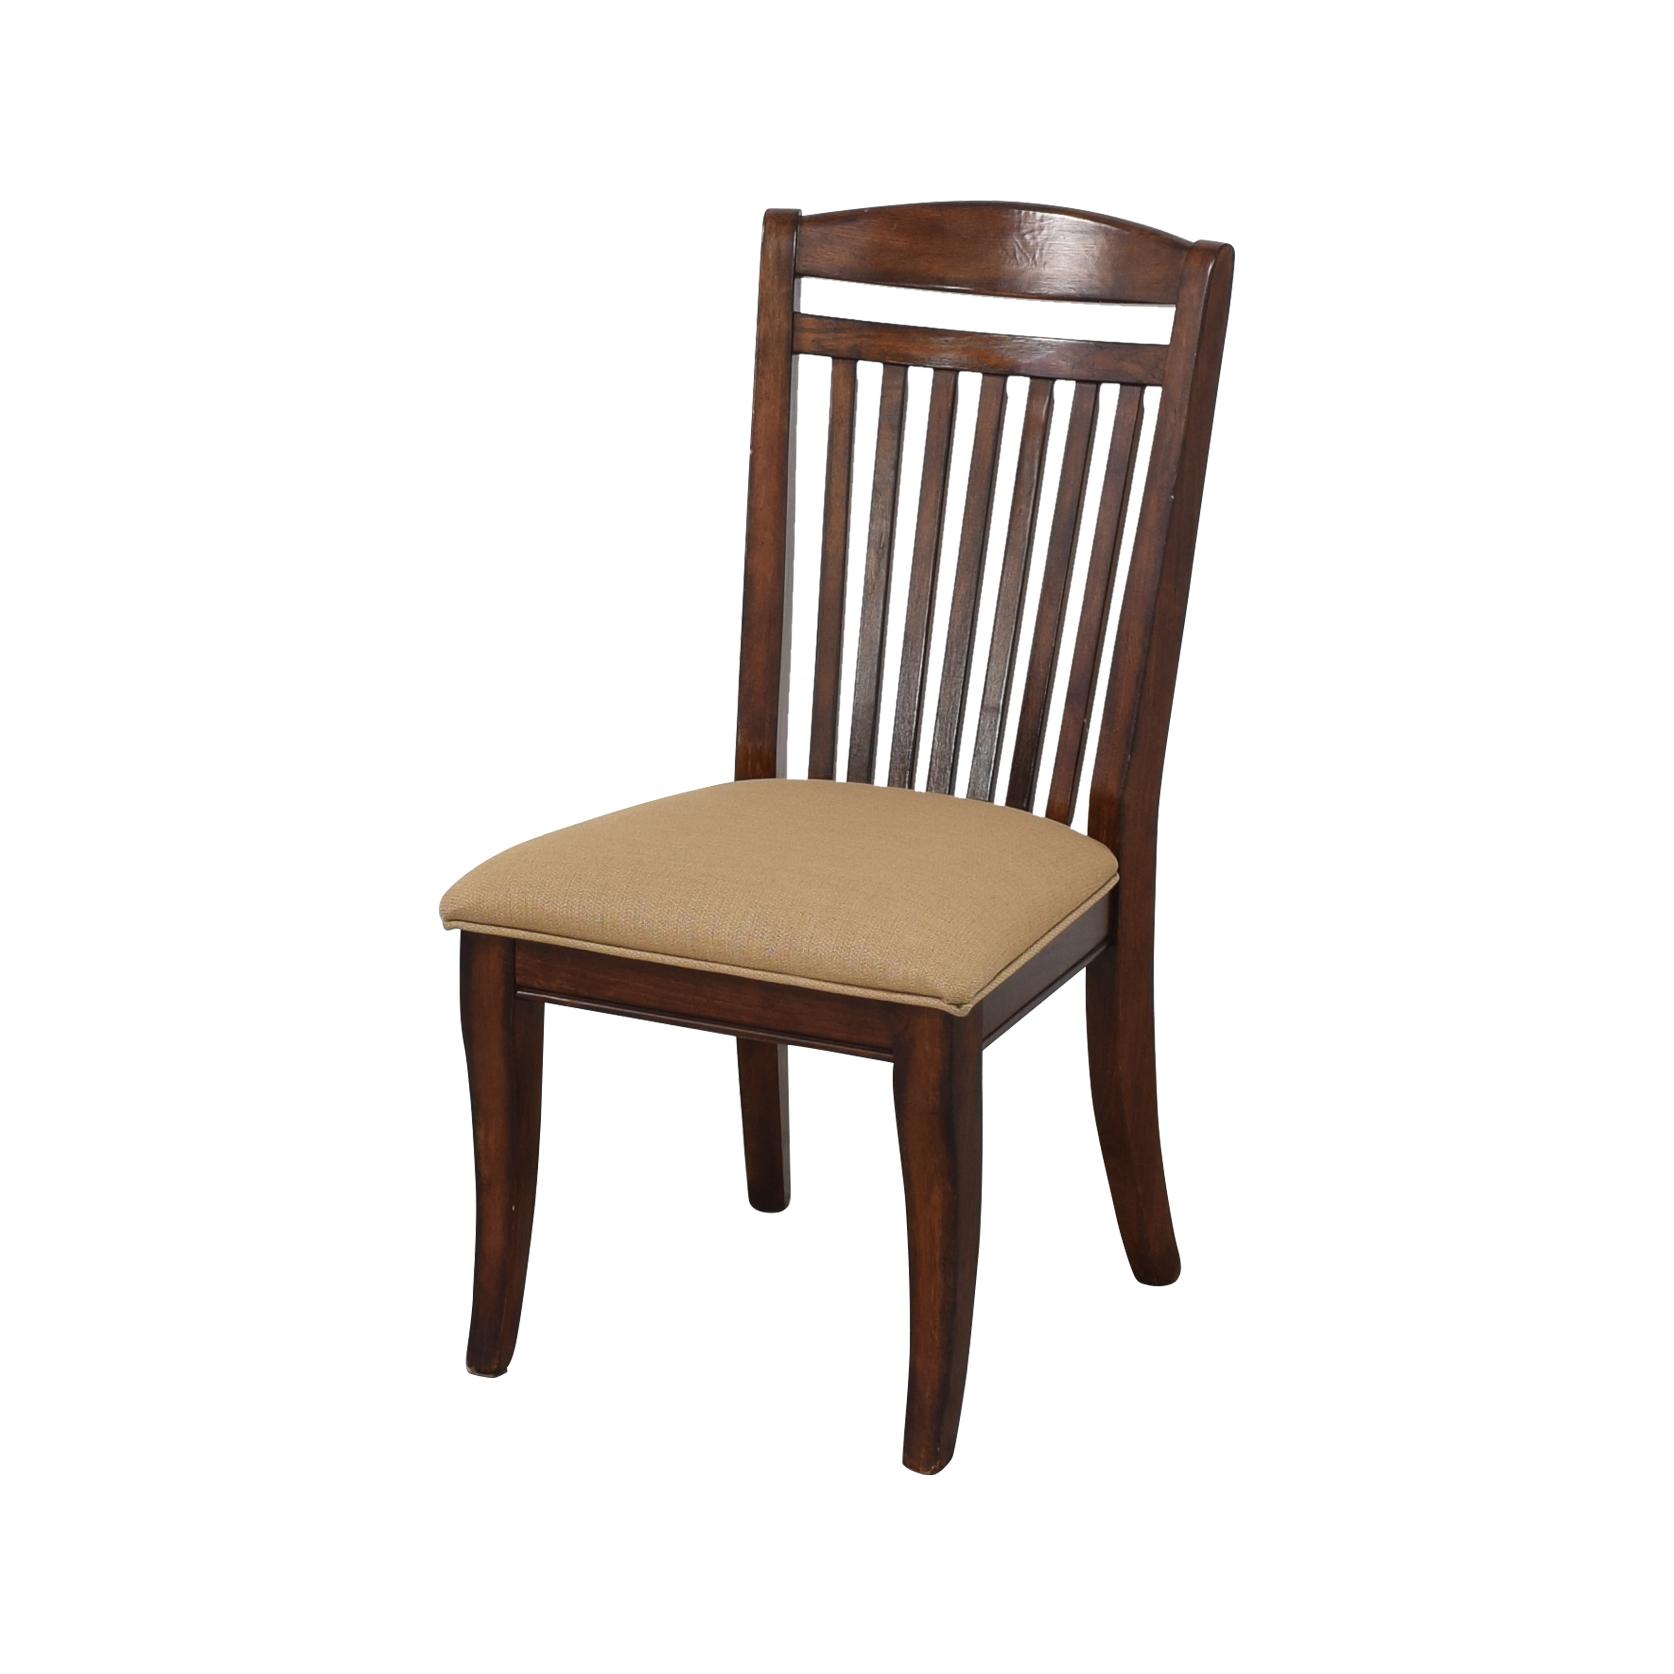 Raymour & Flanigan Raymour & Flanigan Dining Chairs ma